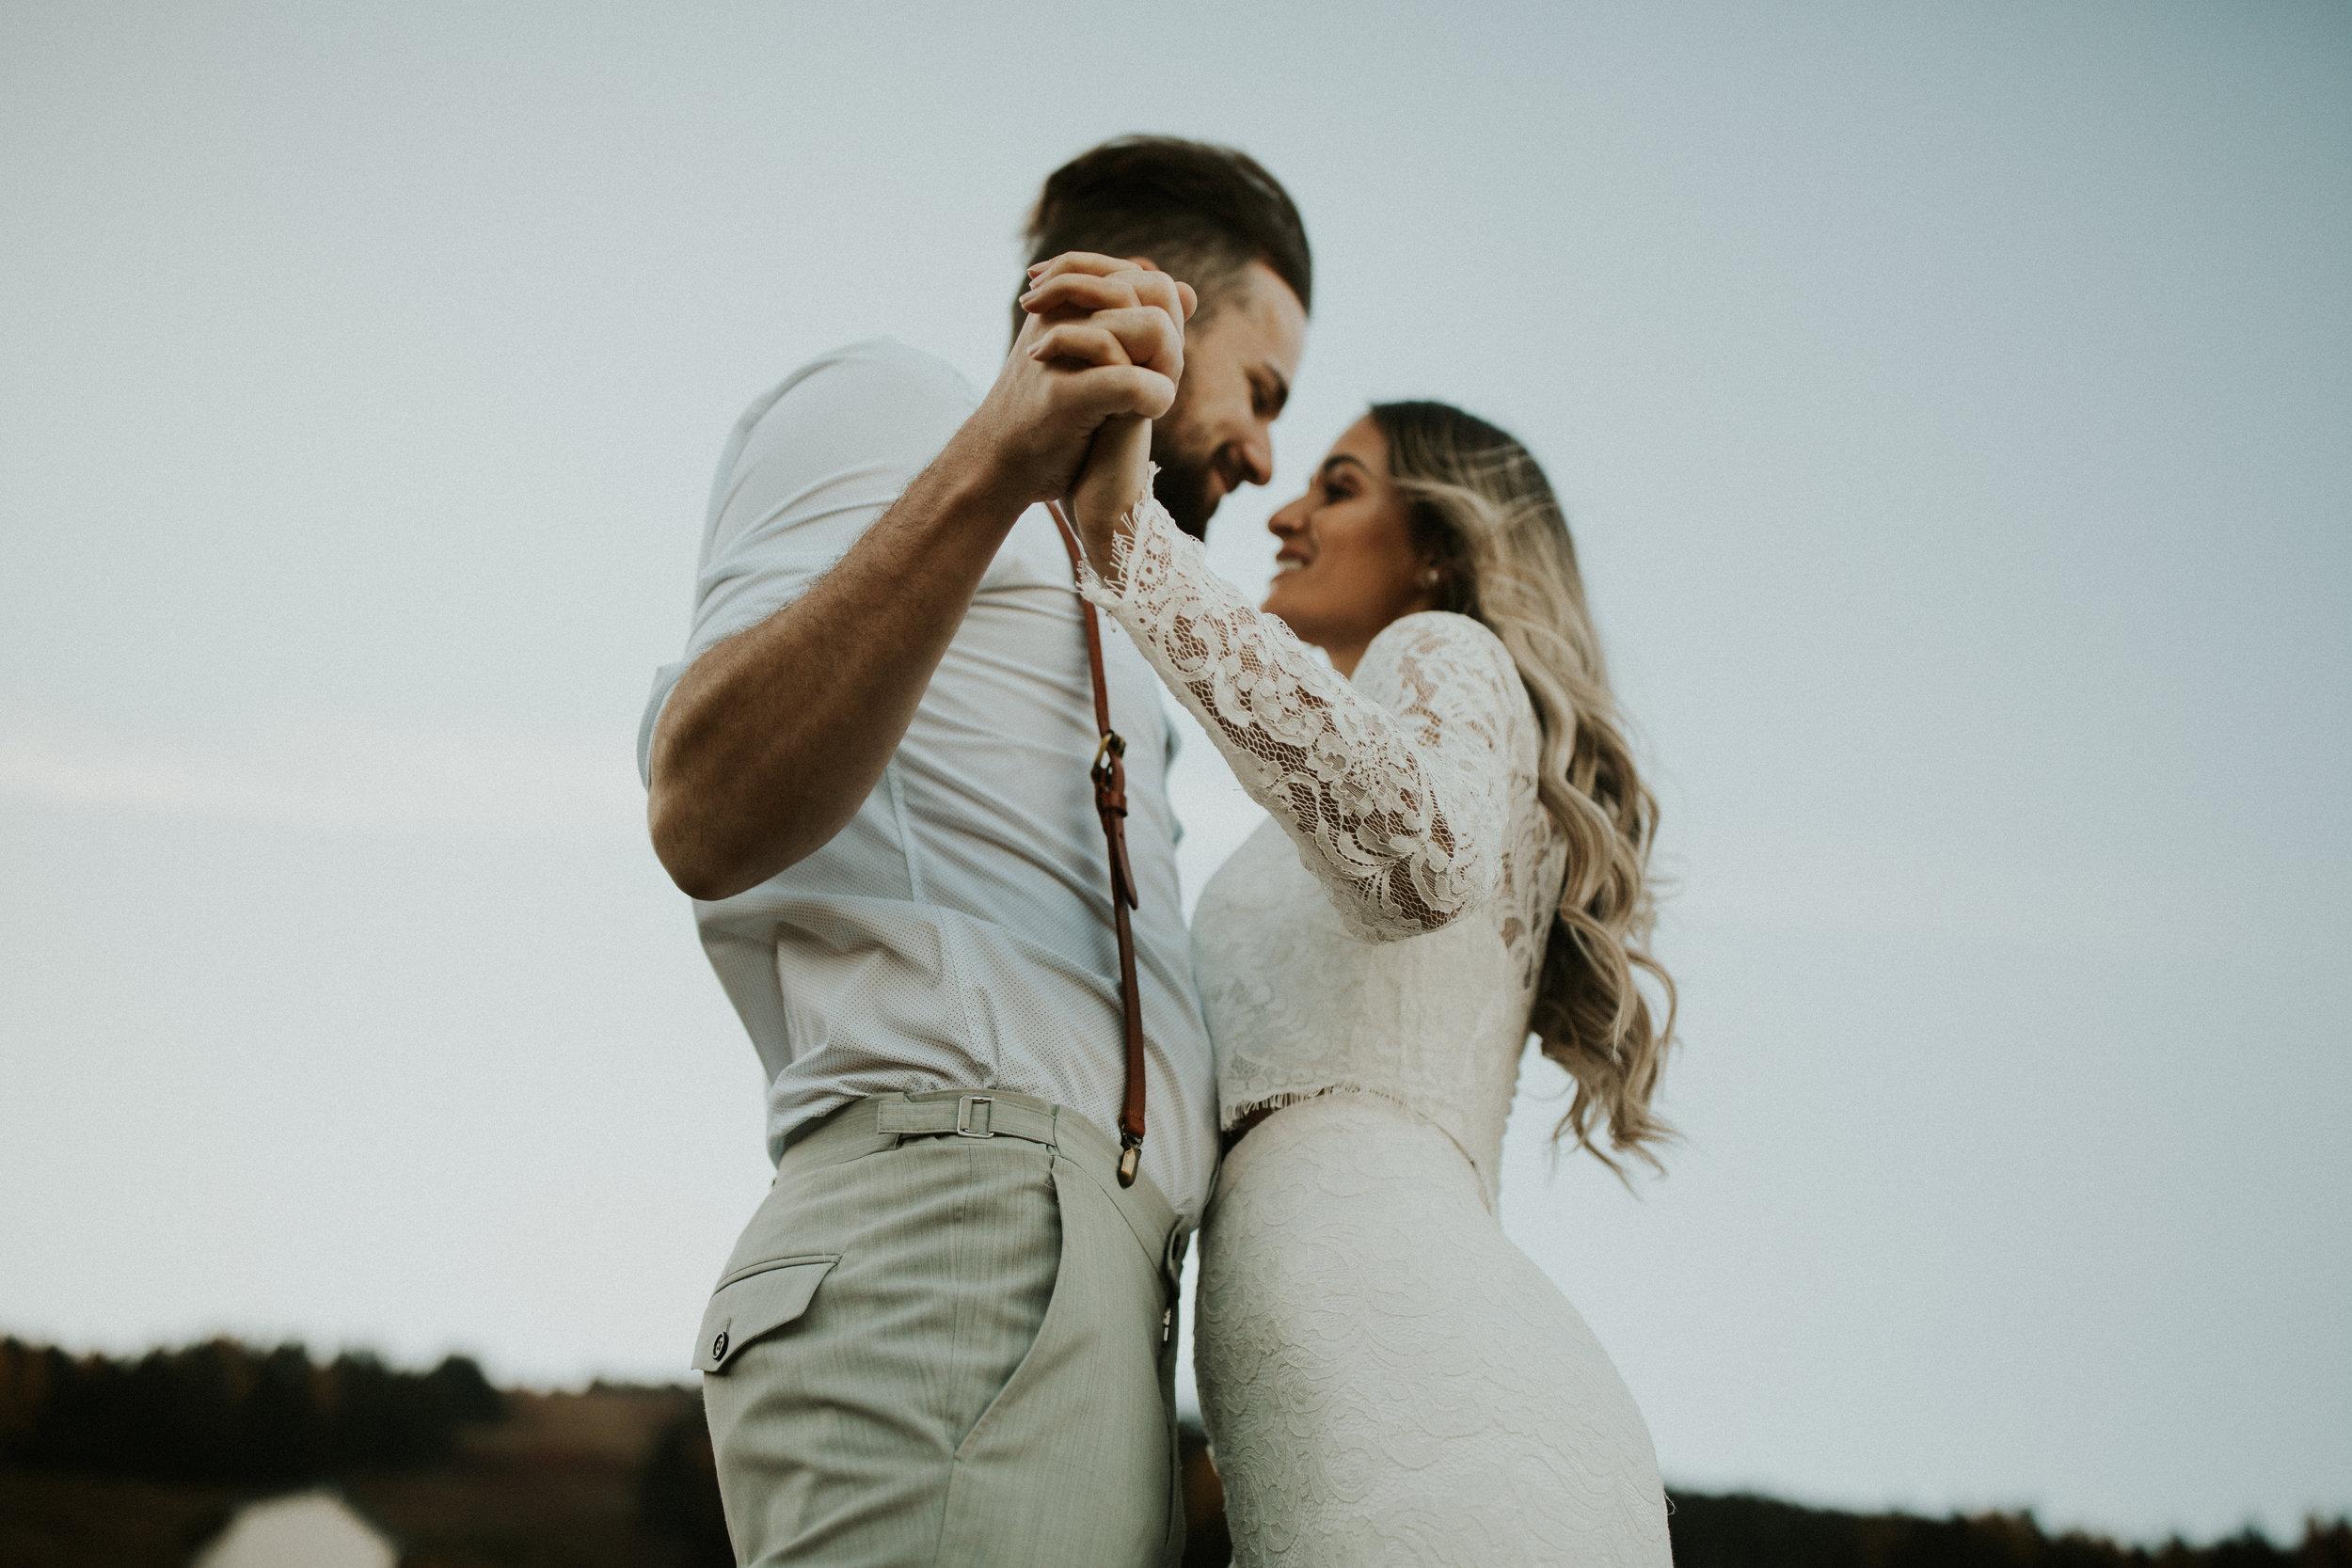 mt Spokane photo shoot couple holding hands image